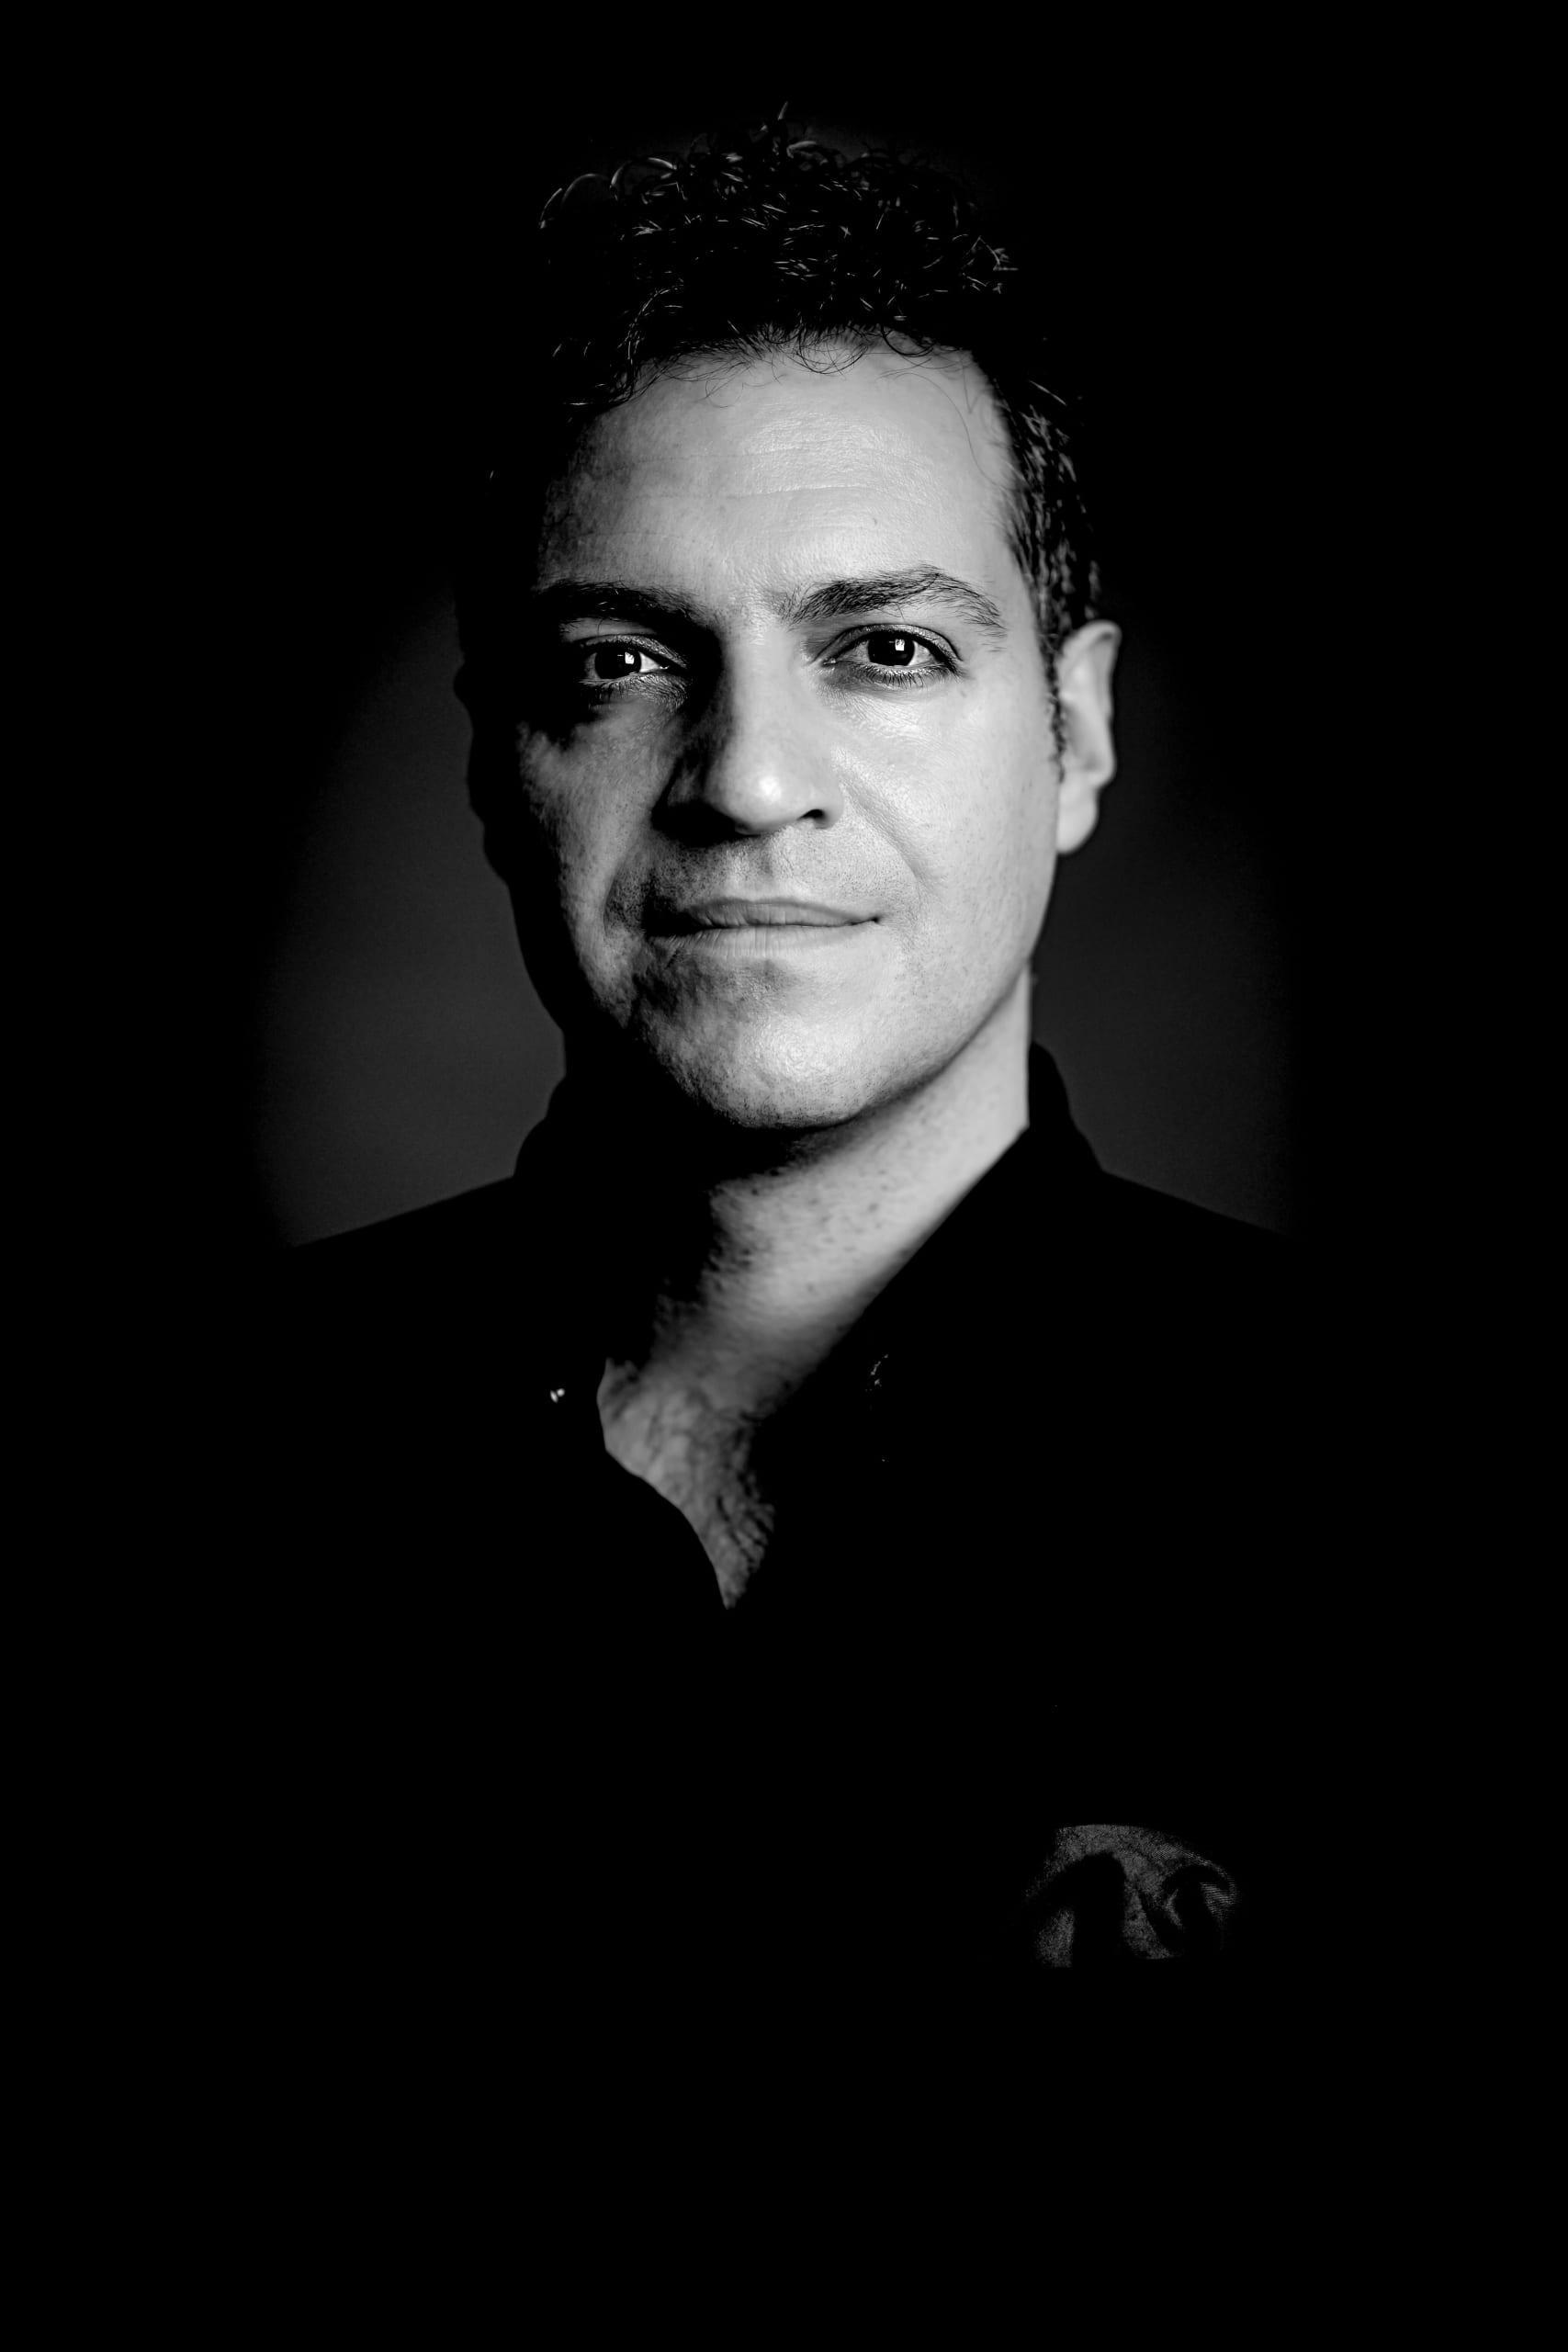 Giuseppe Montesano Portrait